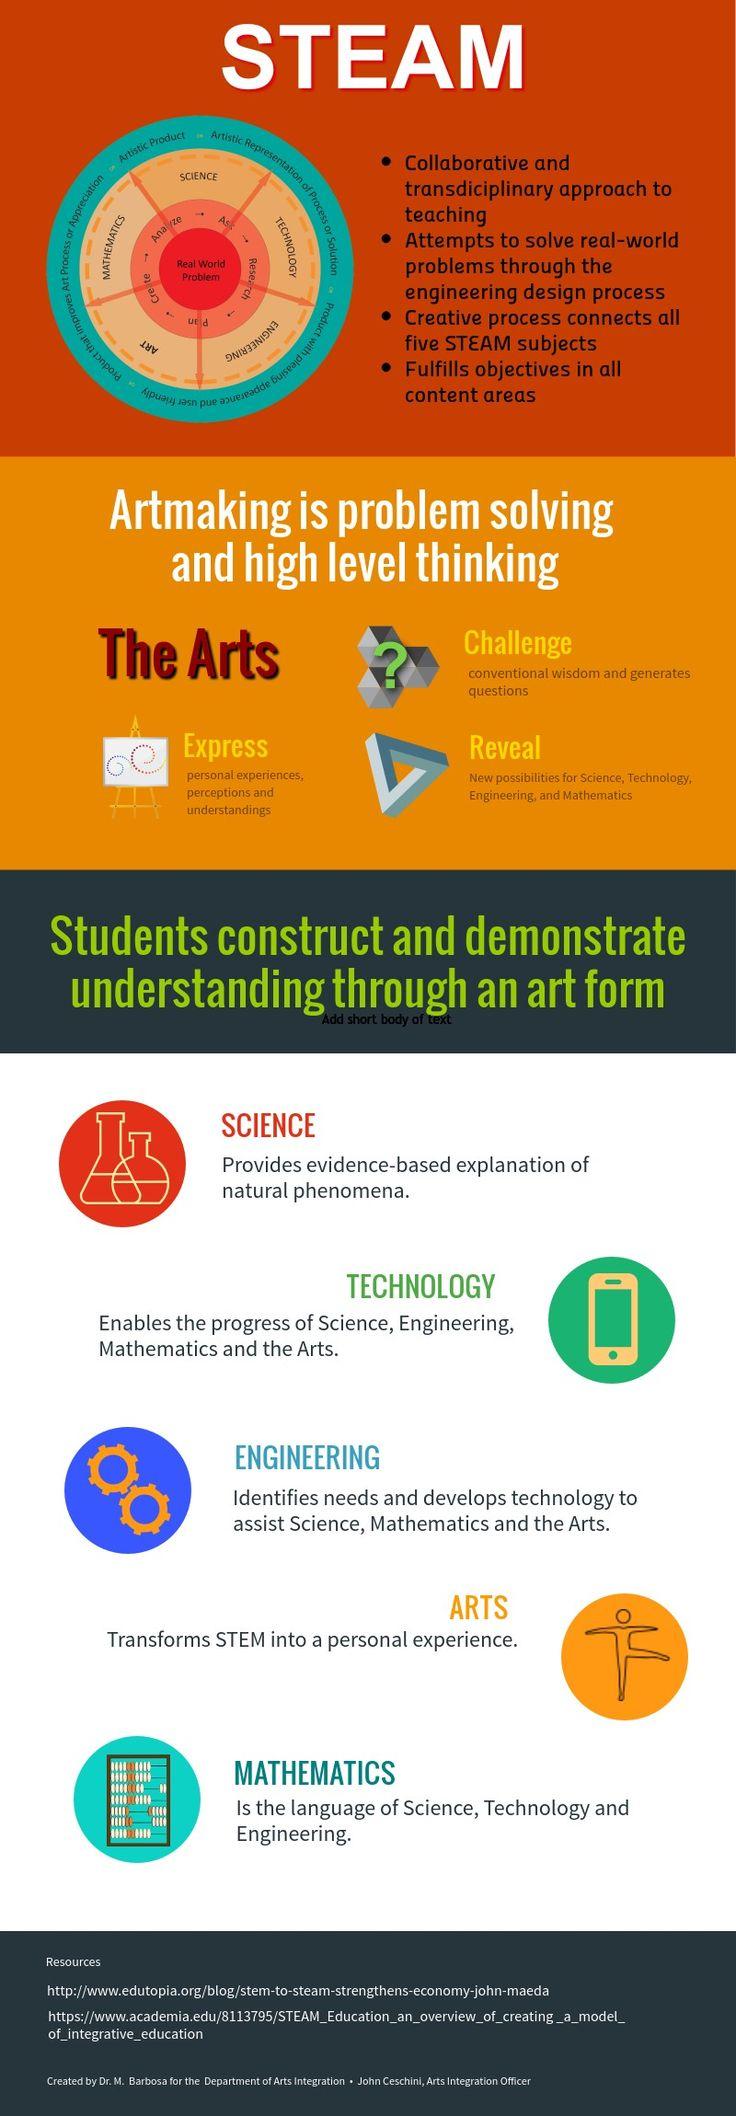 STEAM (Add the arts already STEM people!)